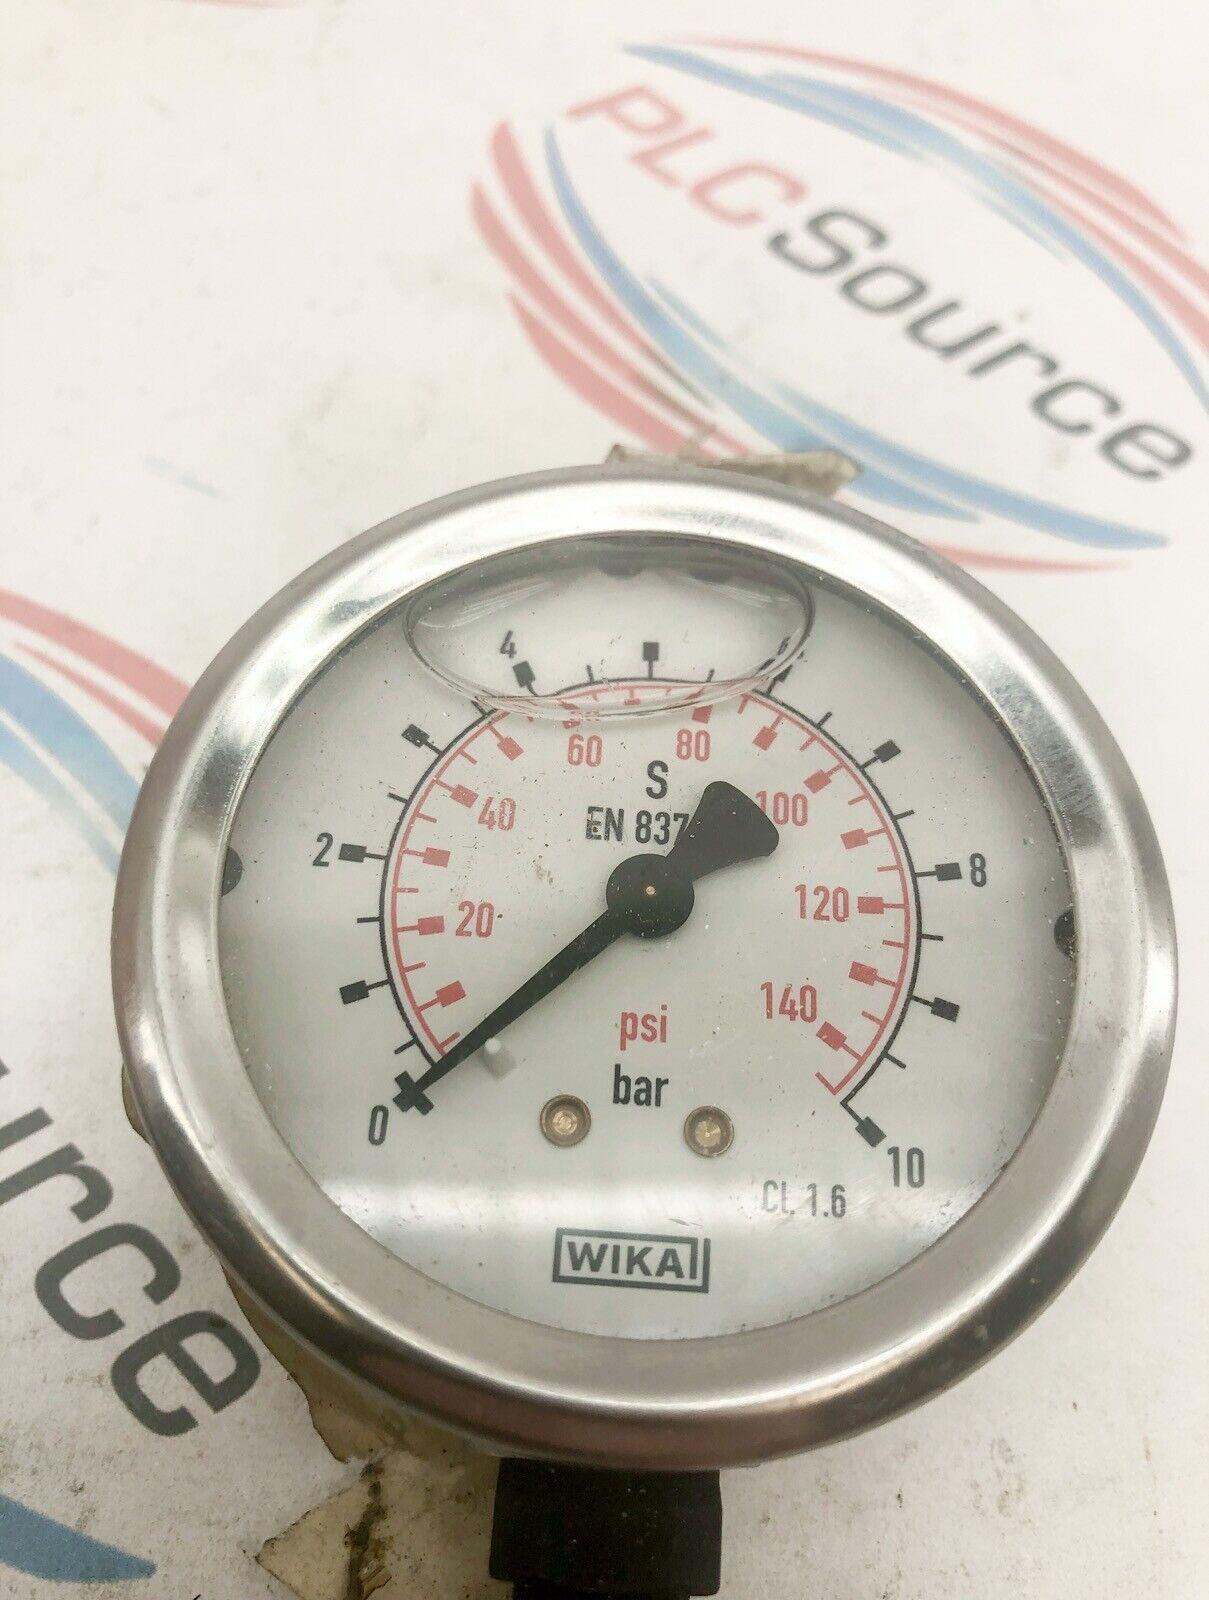 Wika manomètre 700 bar 213.53.100 pression affichage 0-700bar 700bar baranzeige g1//2b